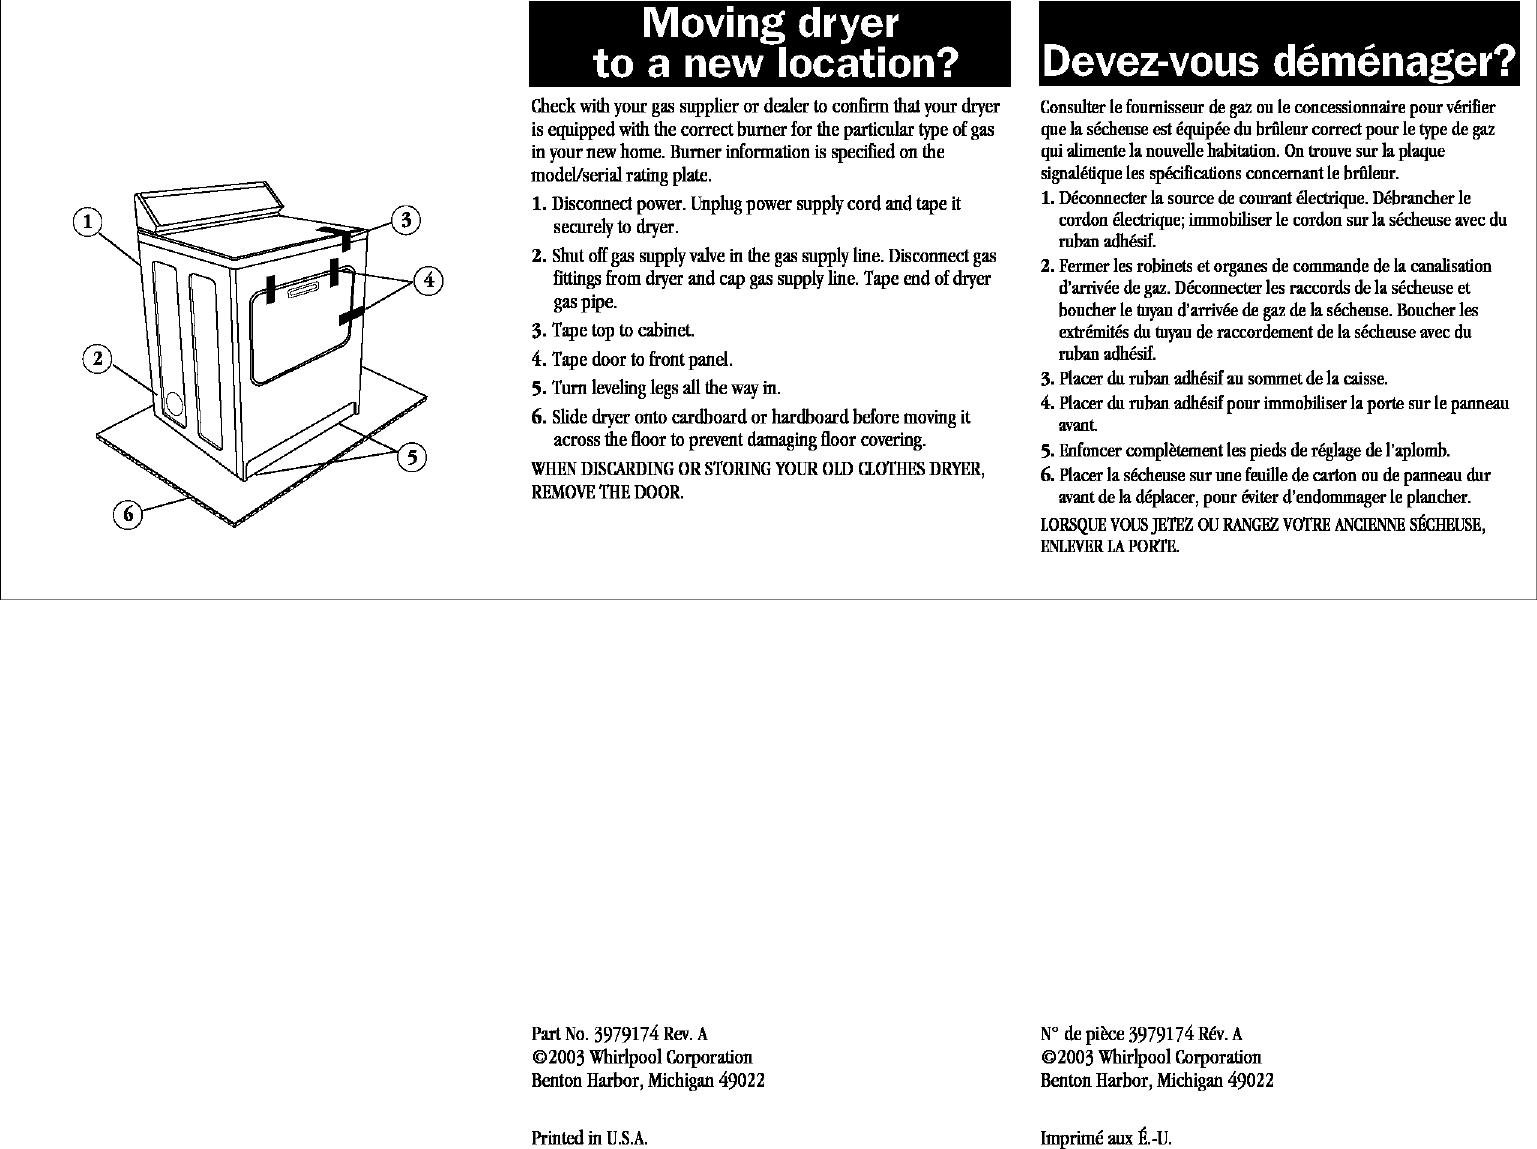 WHIRLPOOL Residential Dryer Manual L0412159